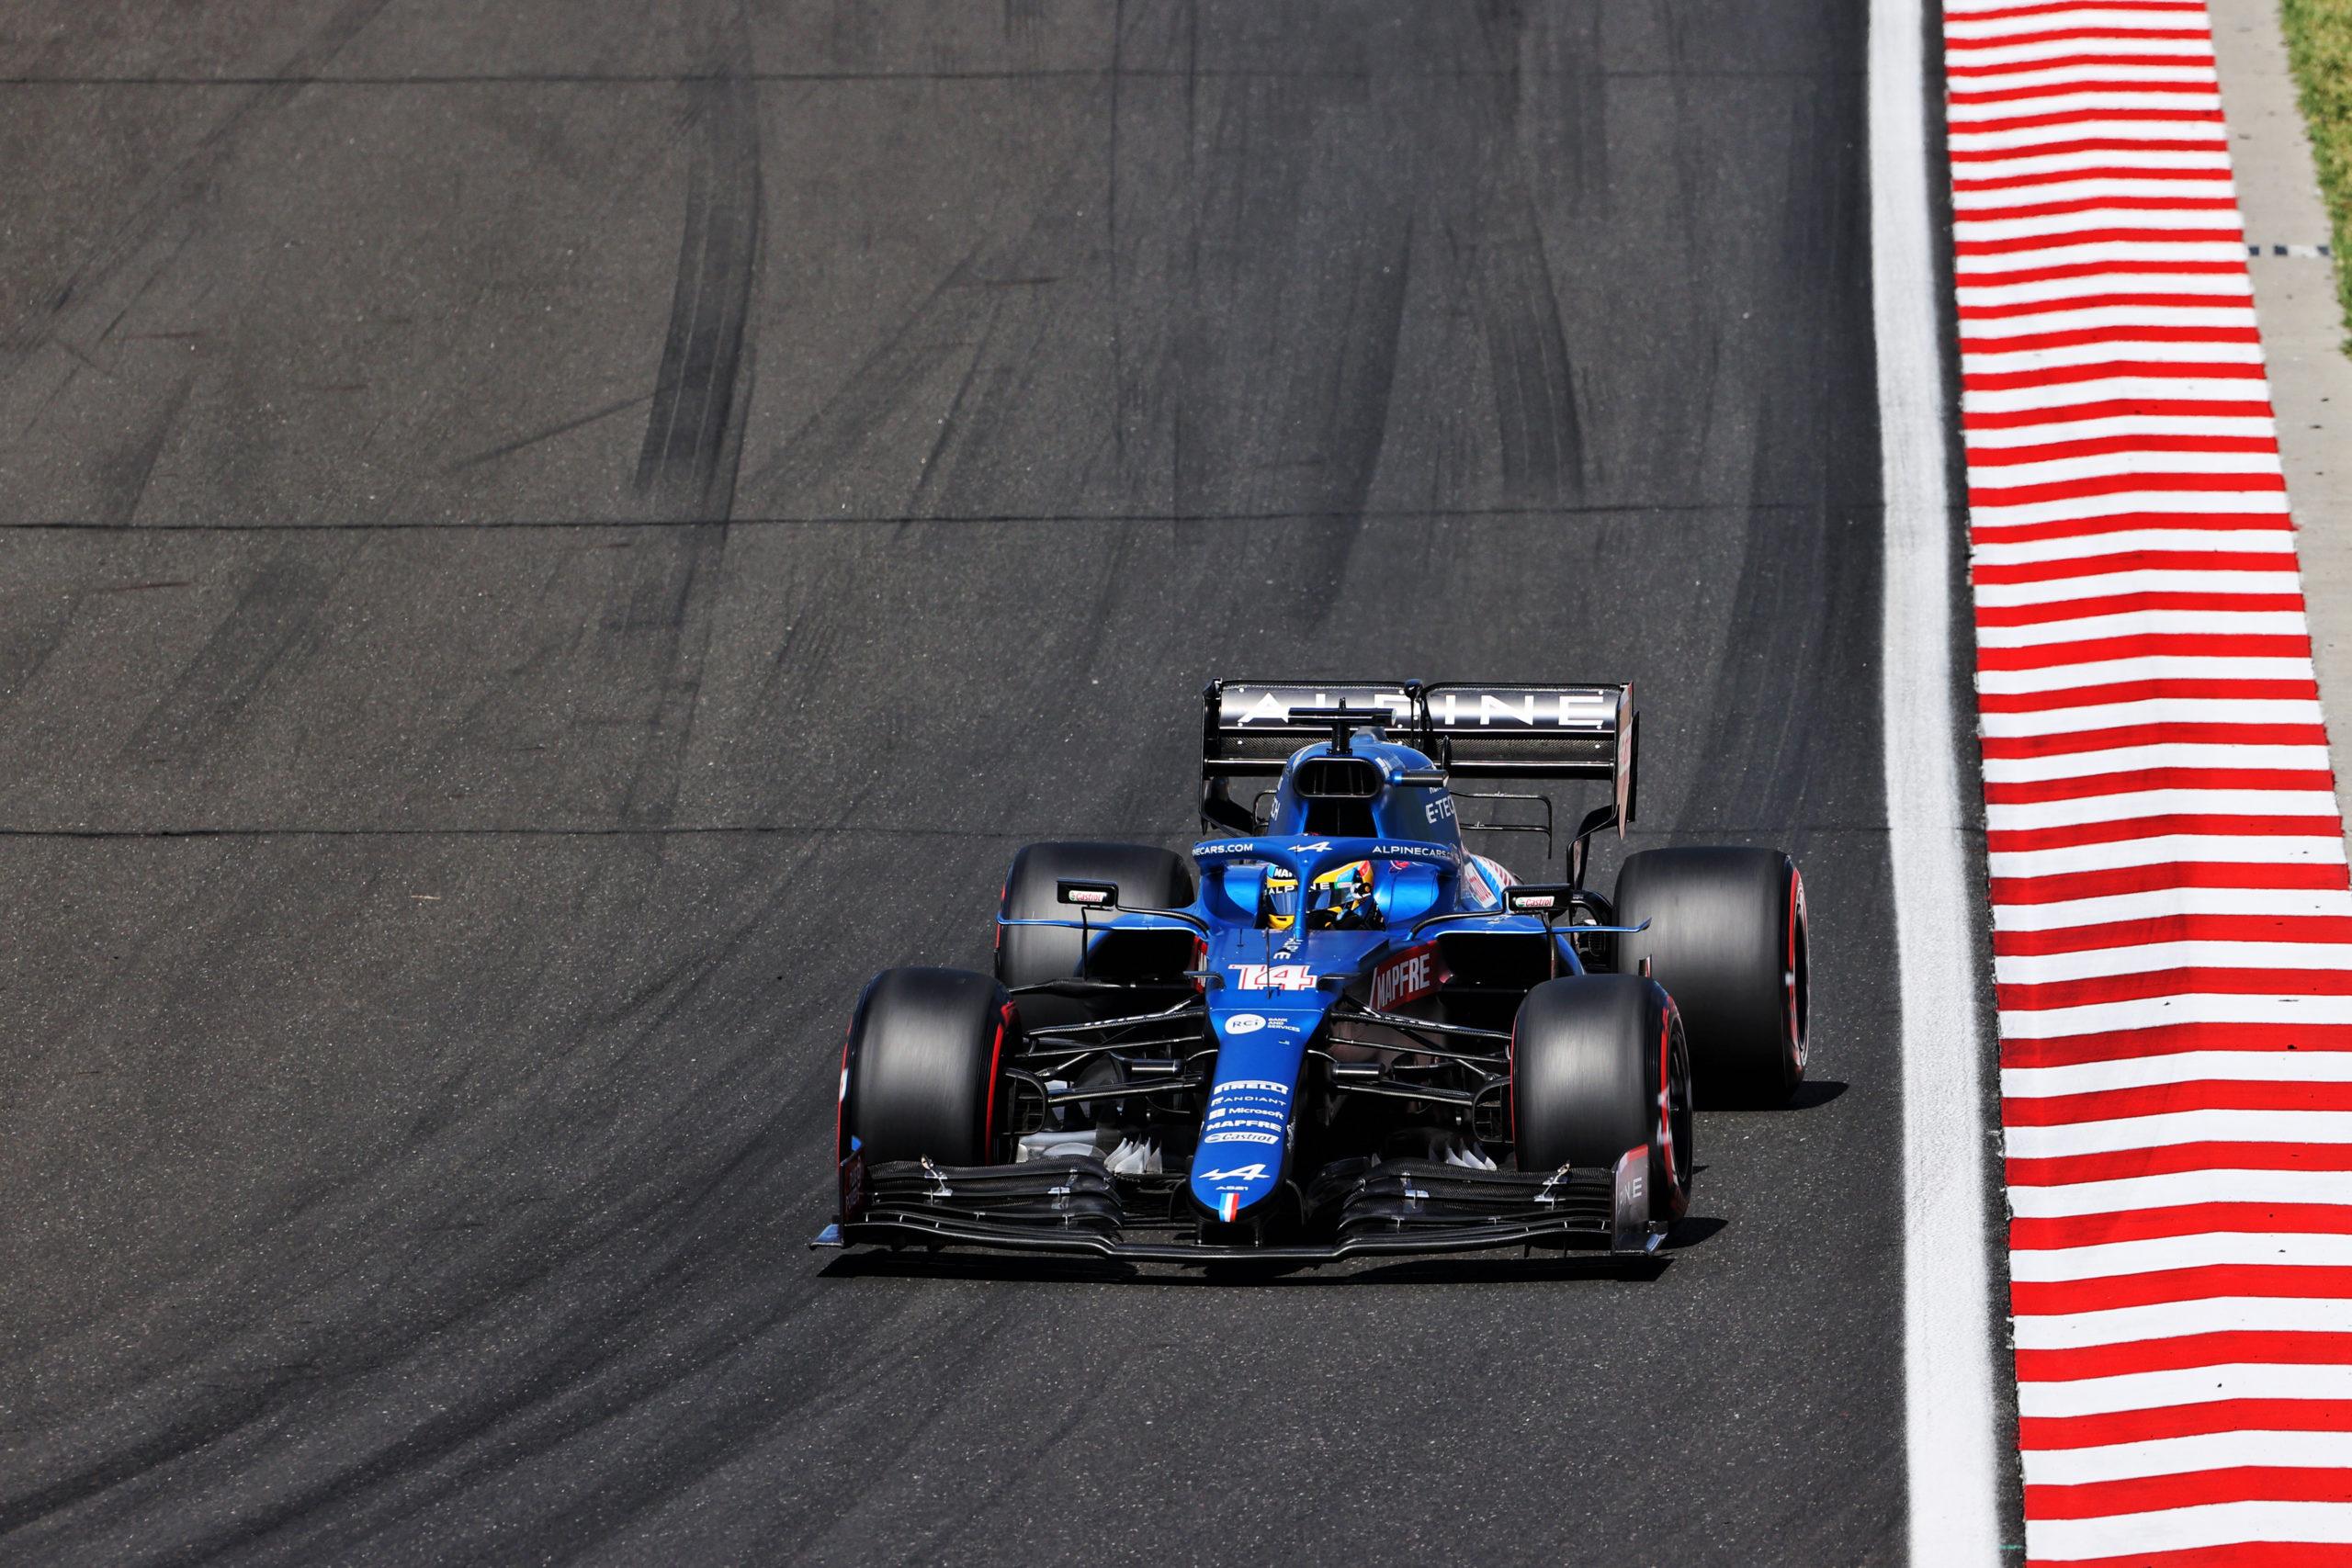 Fernando Alonso (ESP) Alpine F1 Team A521, F1 Grand Prix of Hungary at Hungaroring on July 31, 2021